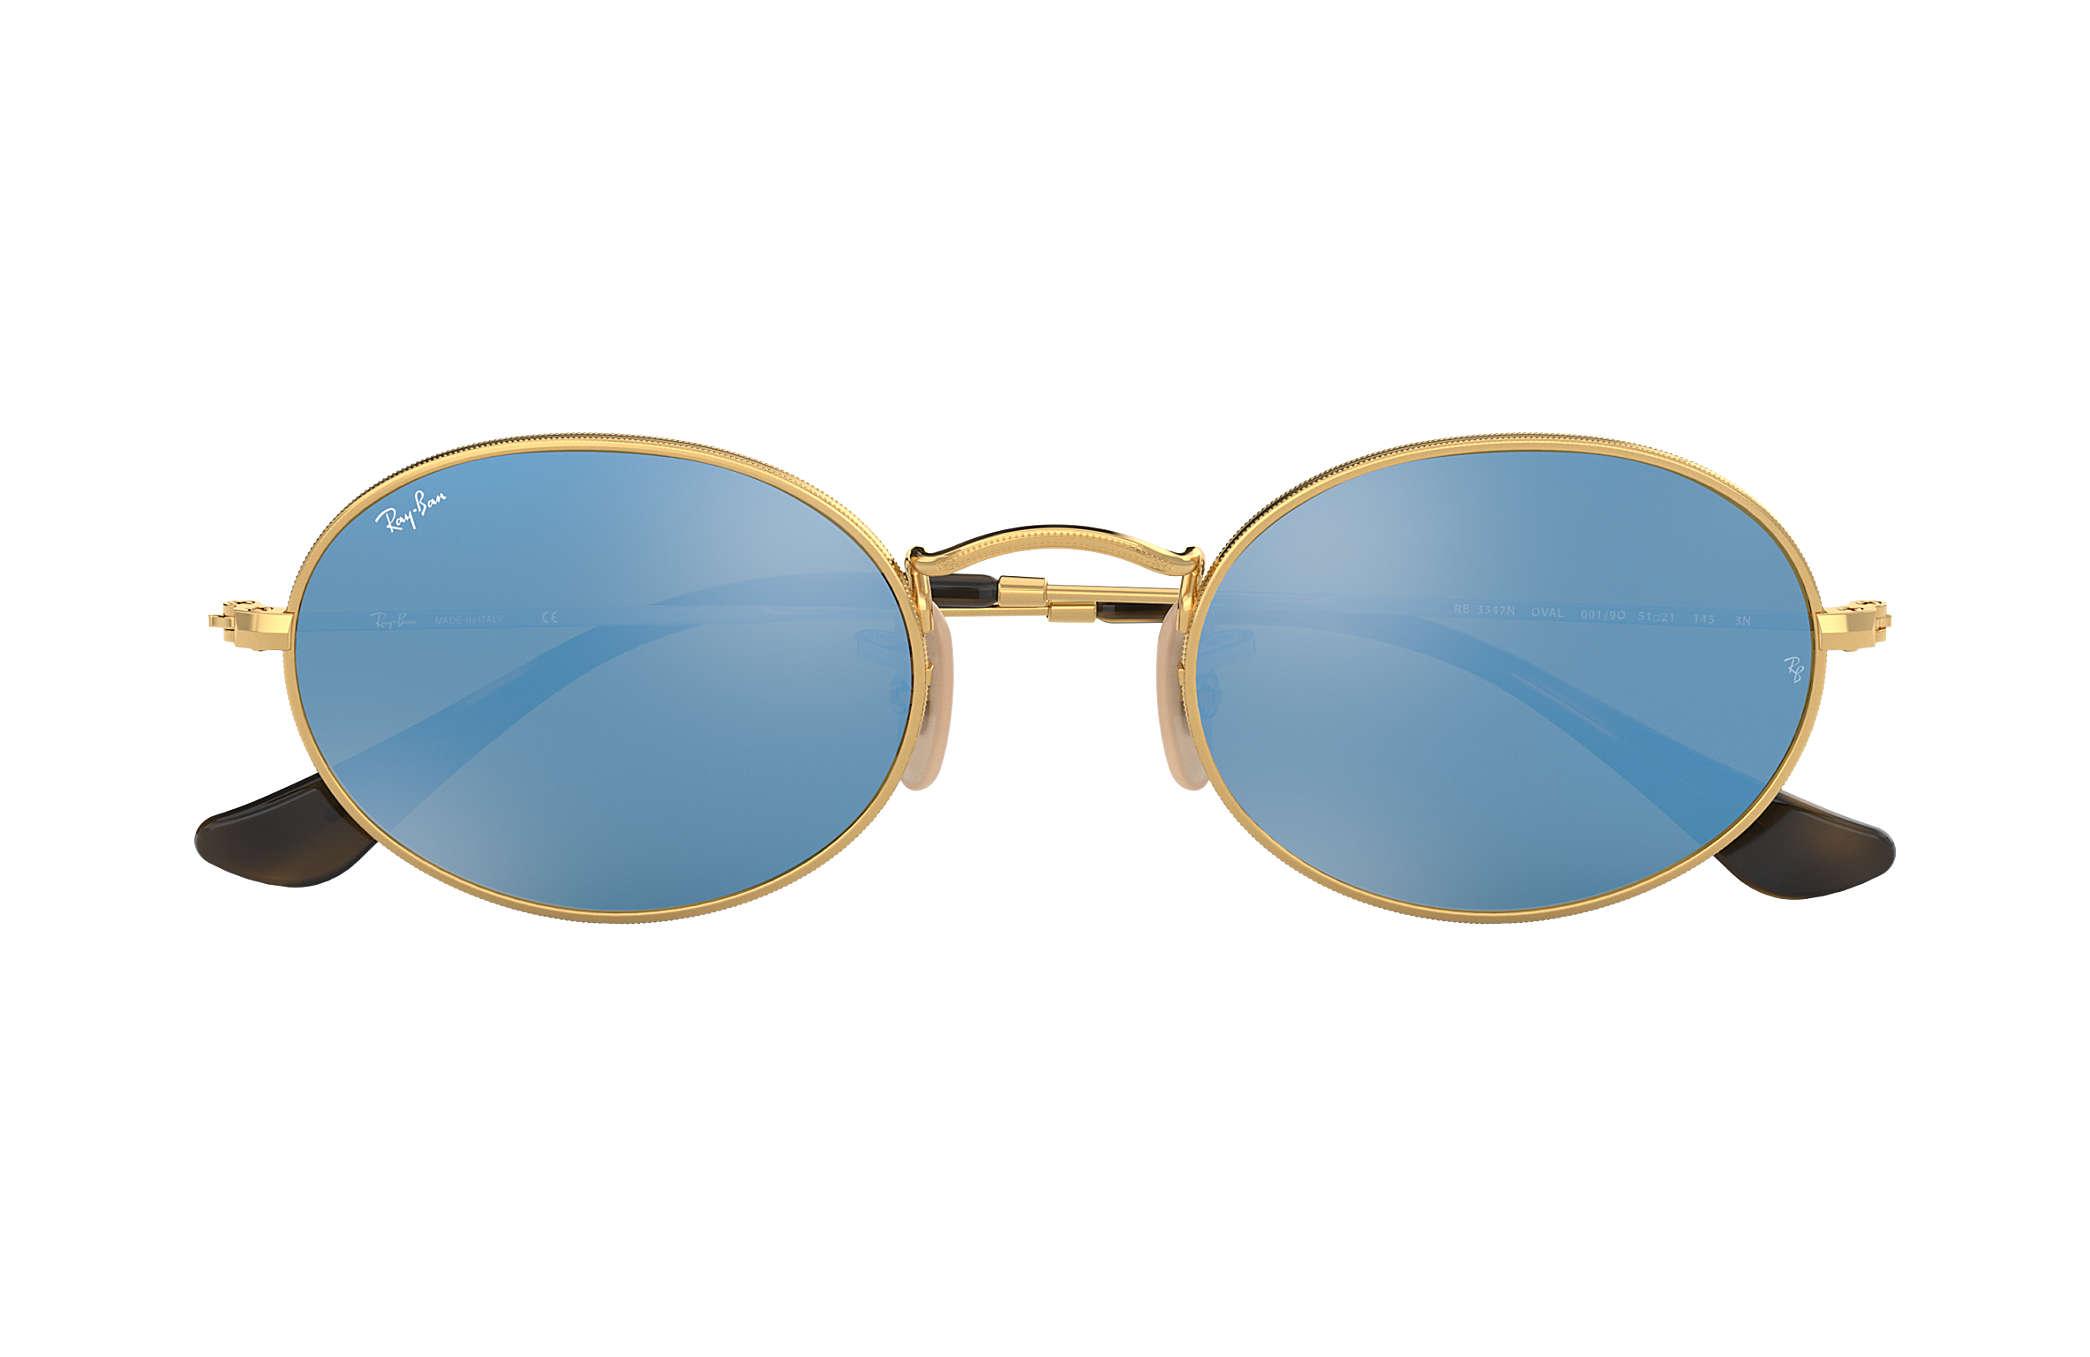 dd10700d3cf Ray-Ban Oval Flat Lenses RB3547N Oro - Metallo - Lenti Azzurro ...